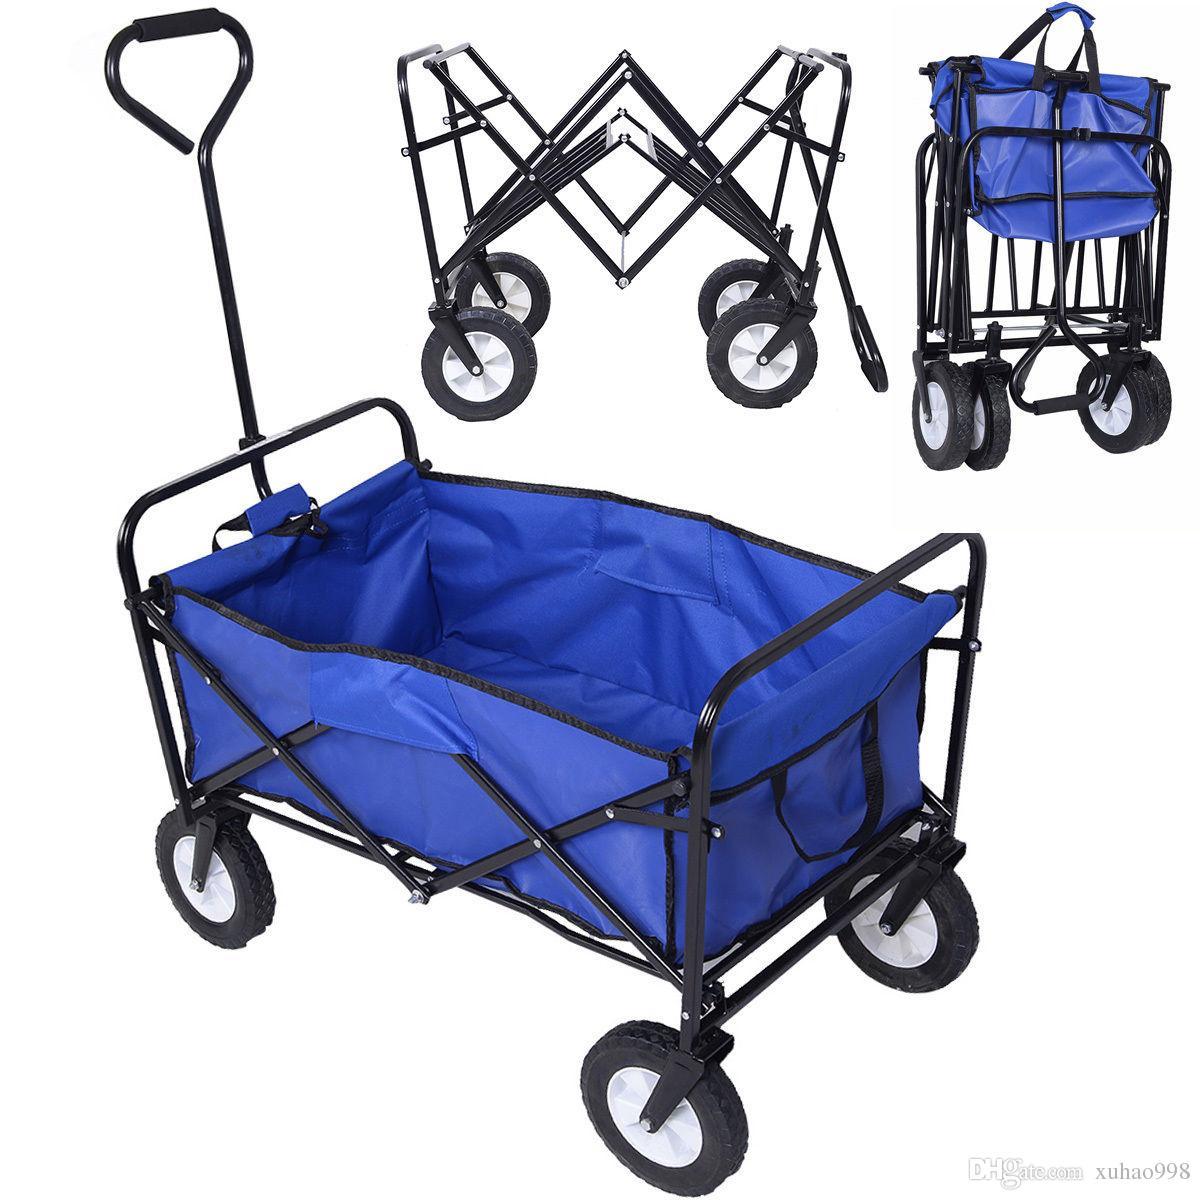 Collapsible Folding Wagon Cart Cart Garden